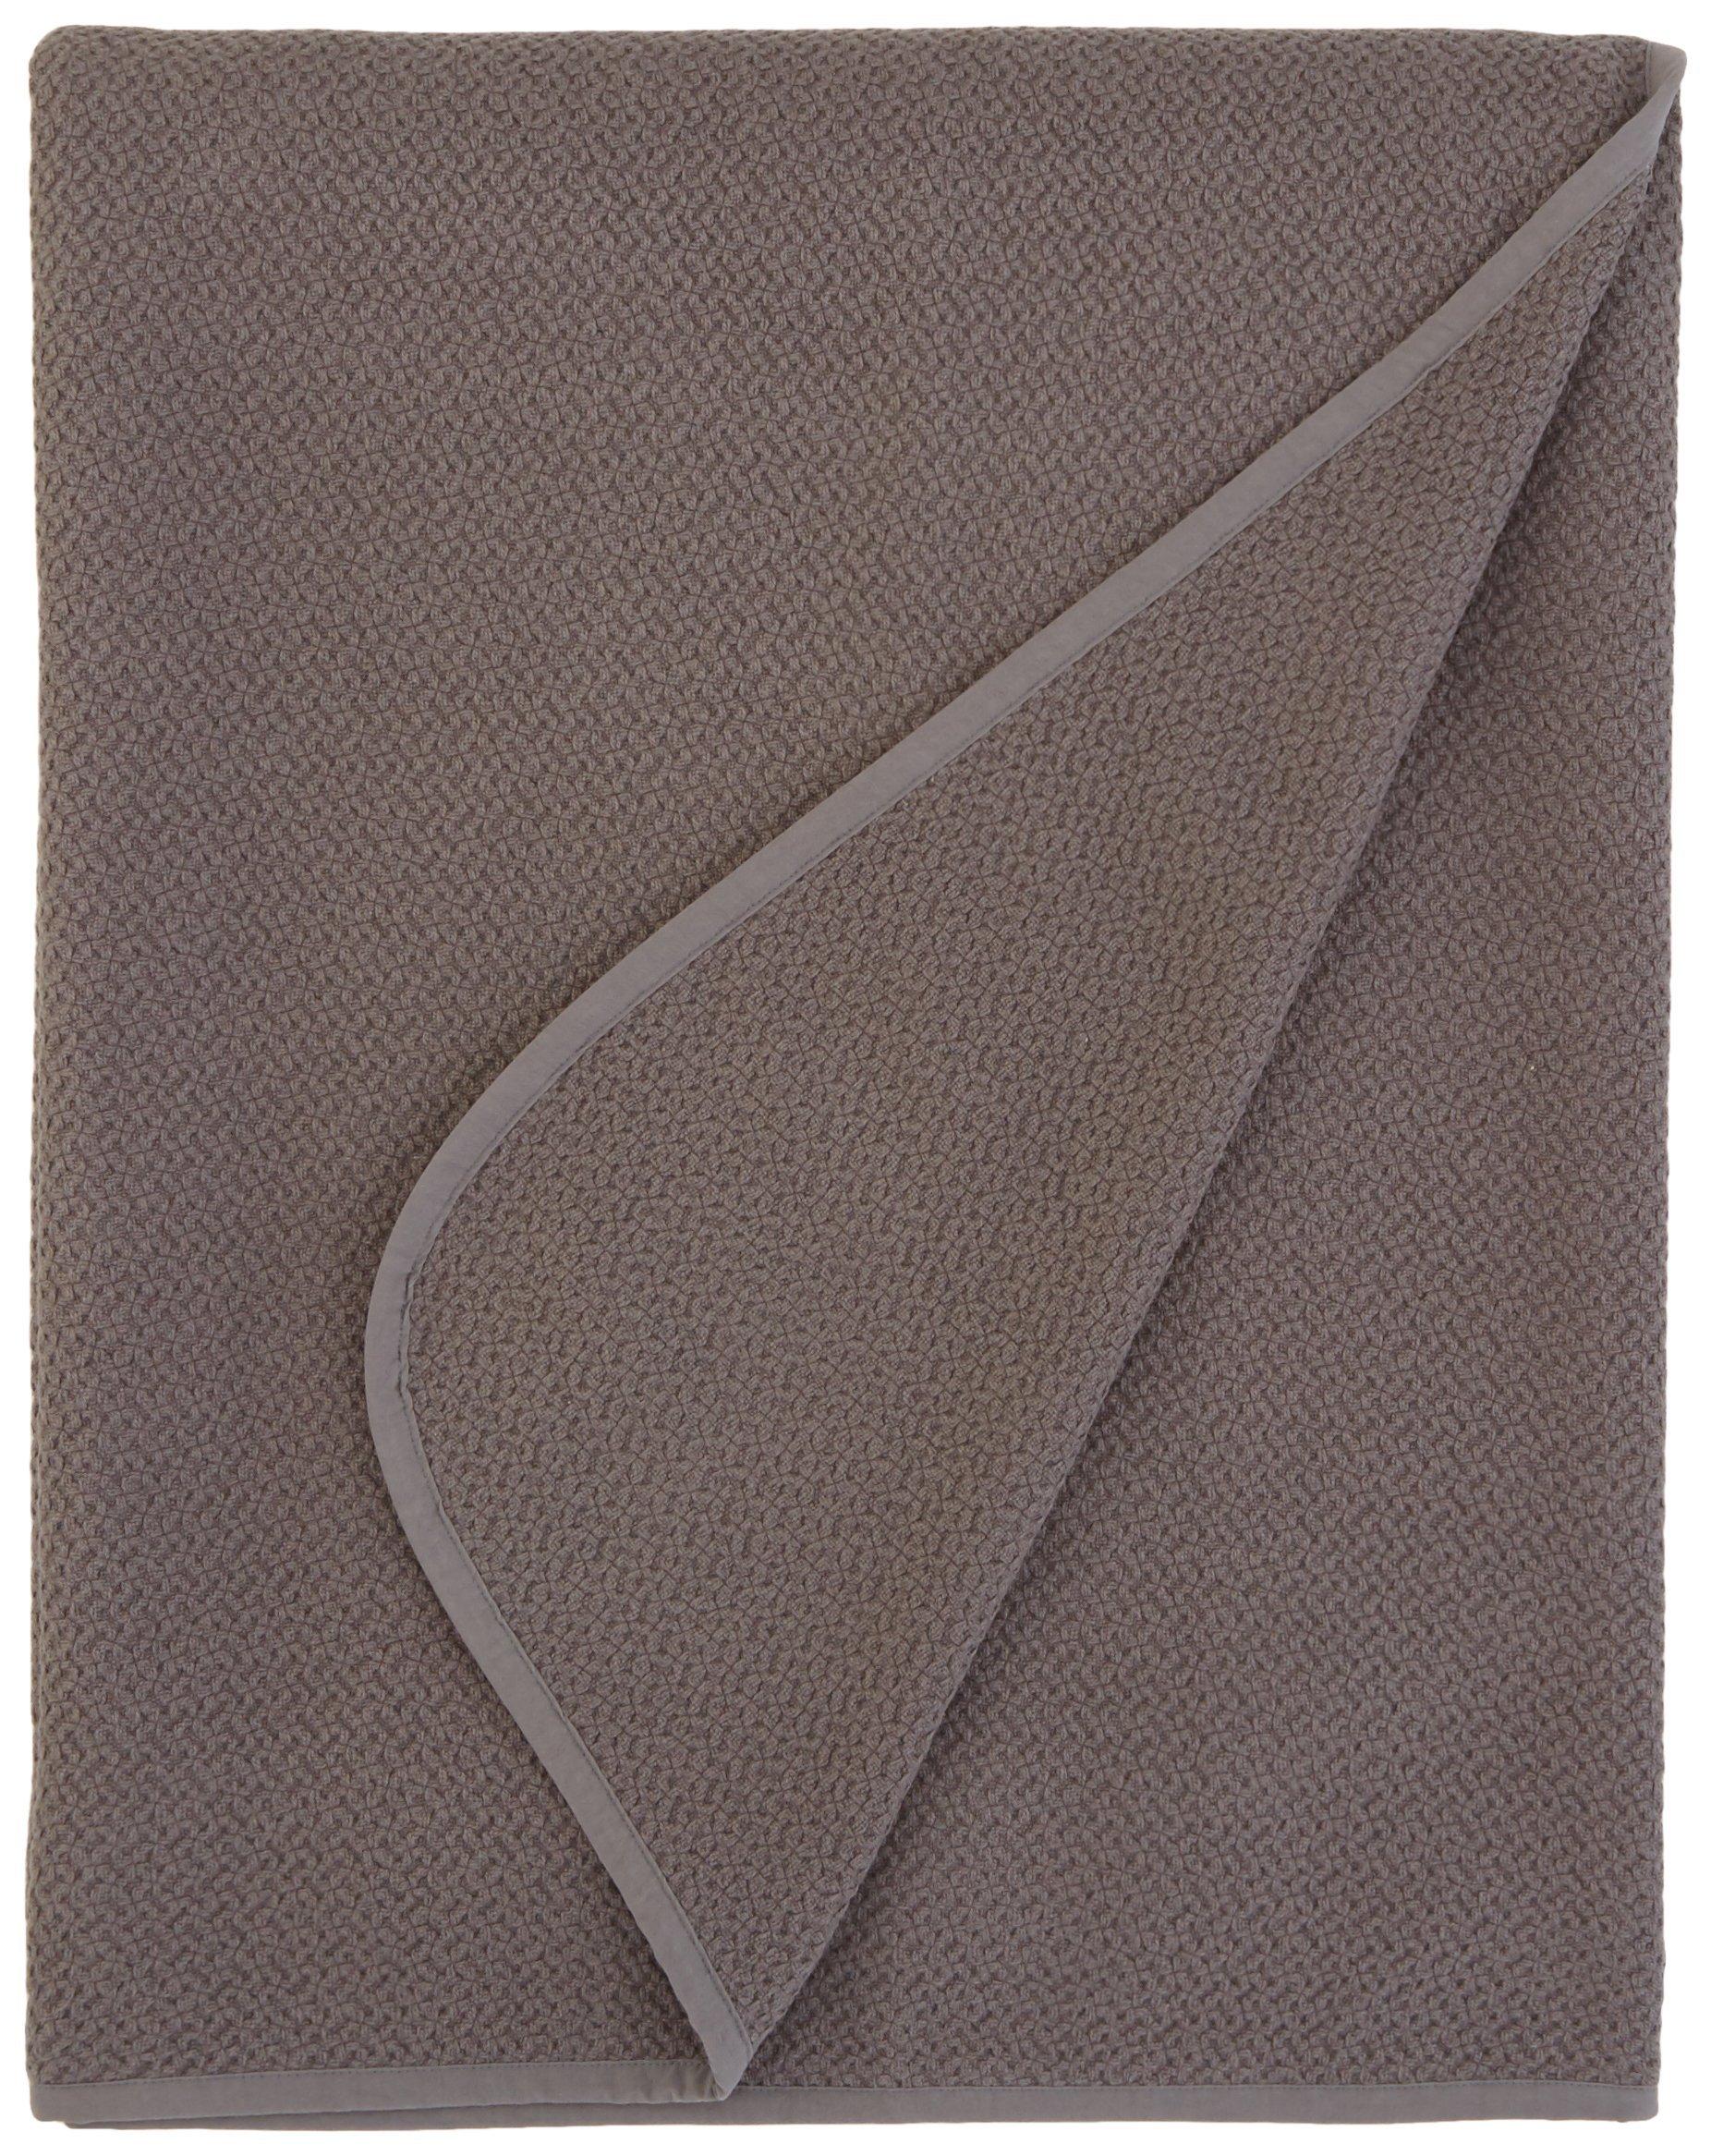 Coyuchi Honeycomb Organic Blanket, King, Mid Gray